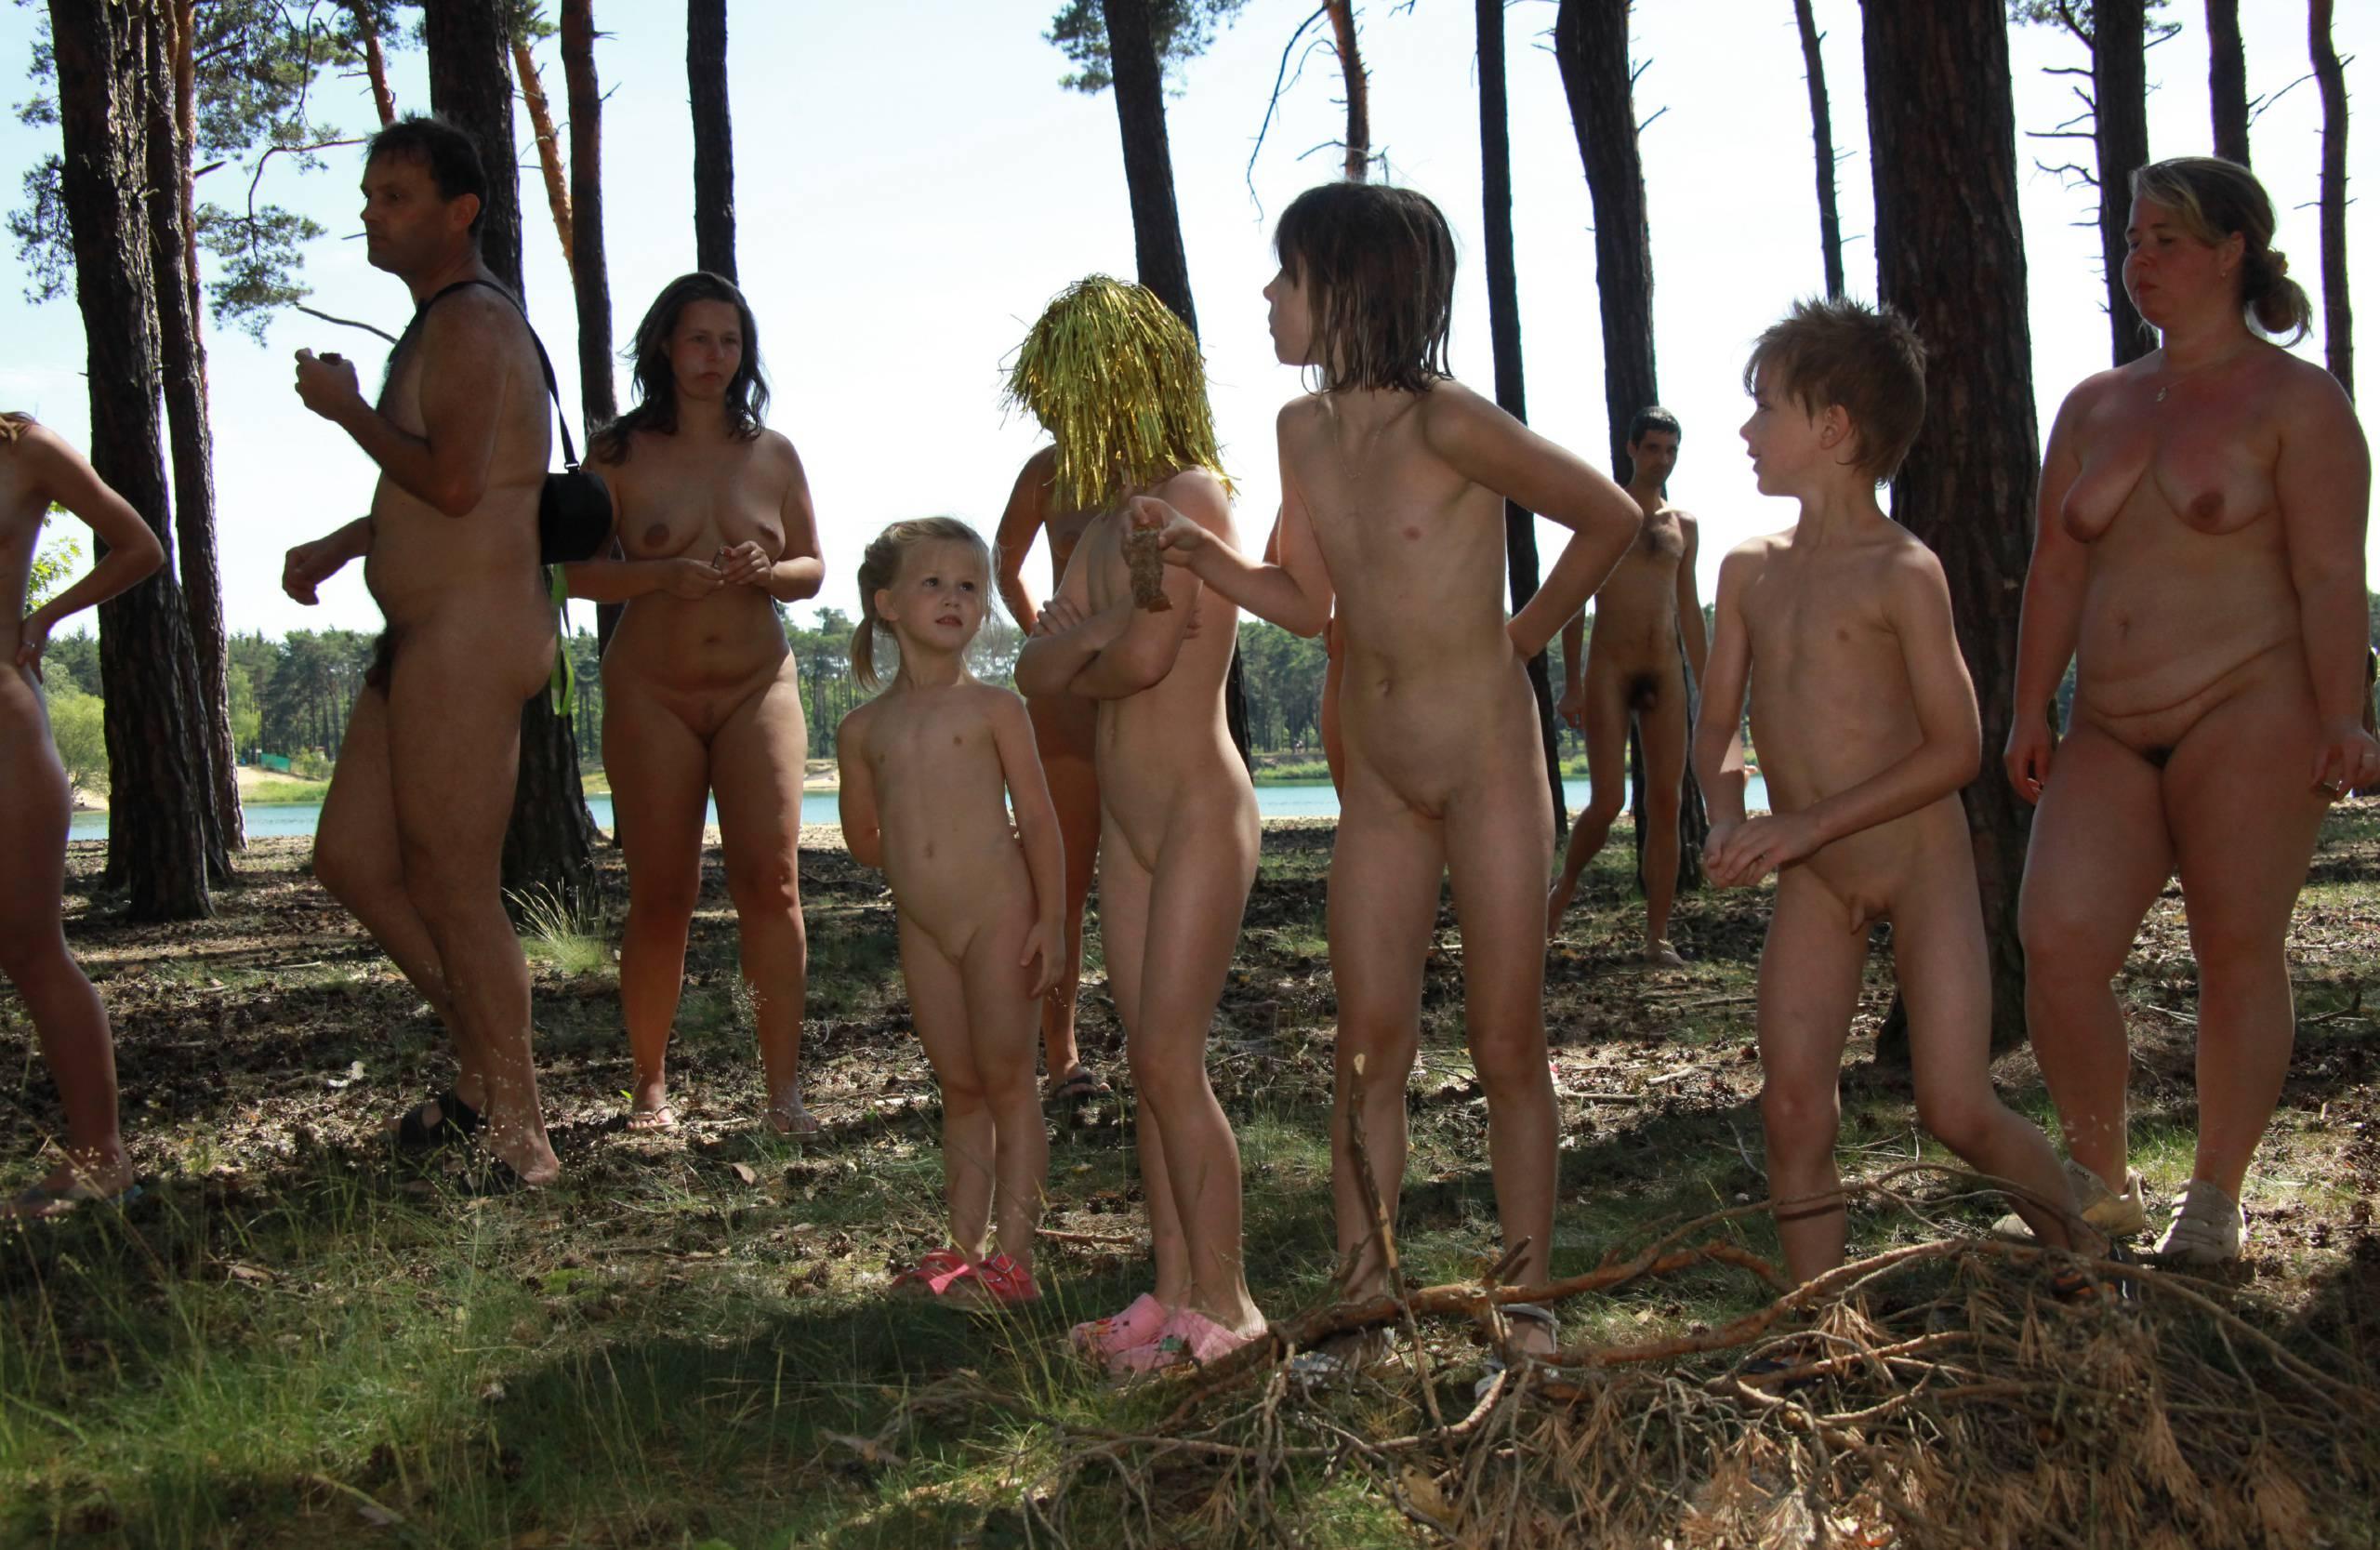 Nudist Gallery Summer Sun Nudists - 1